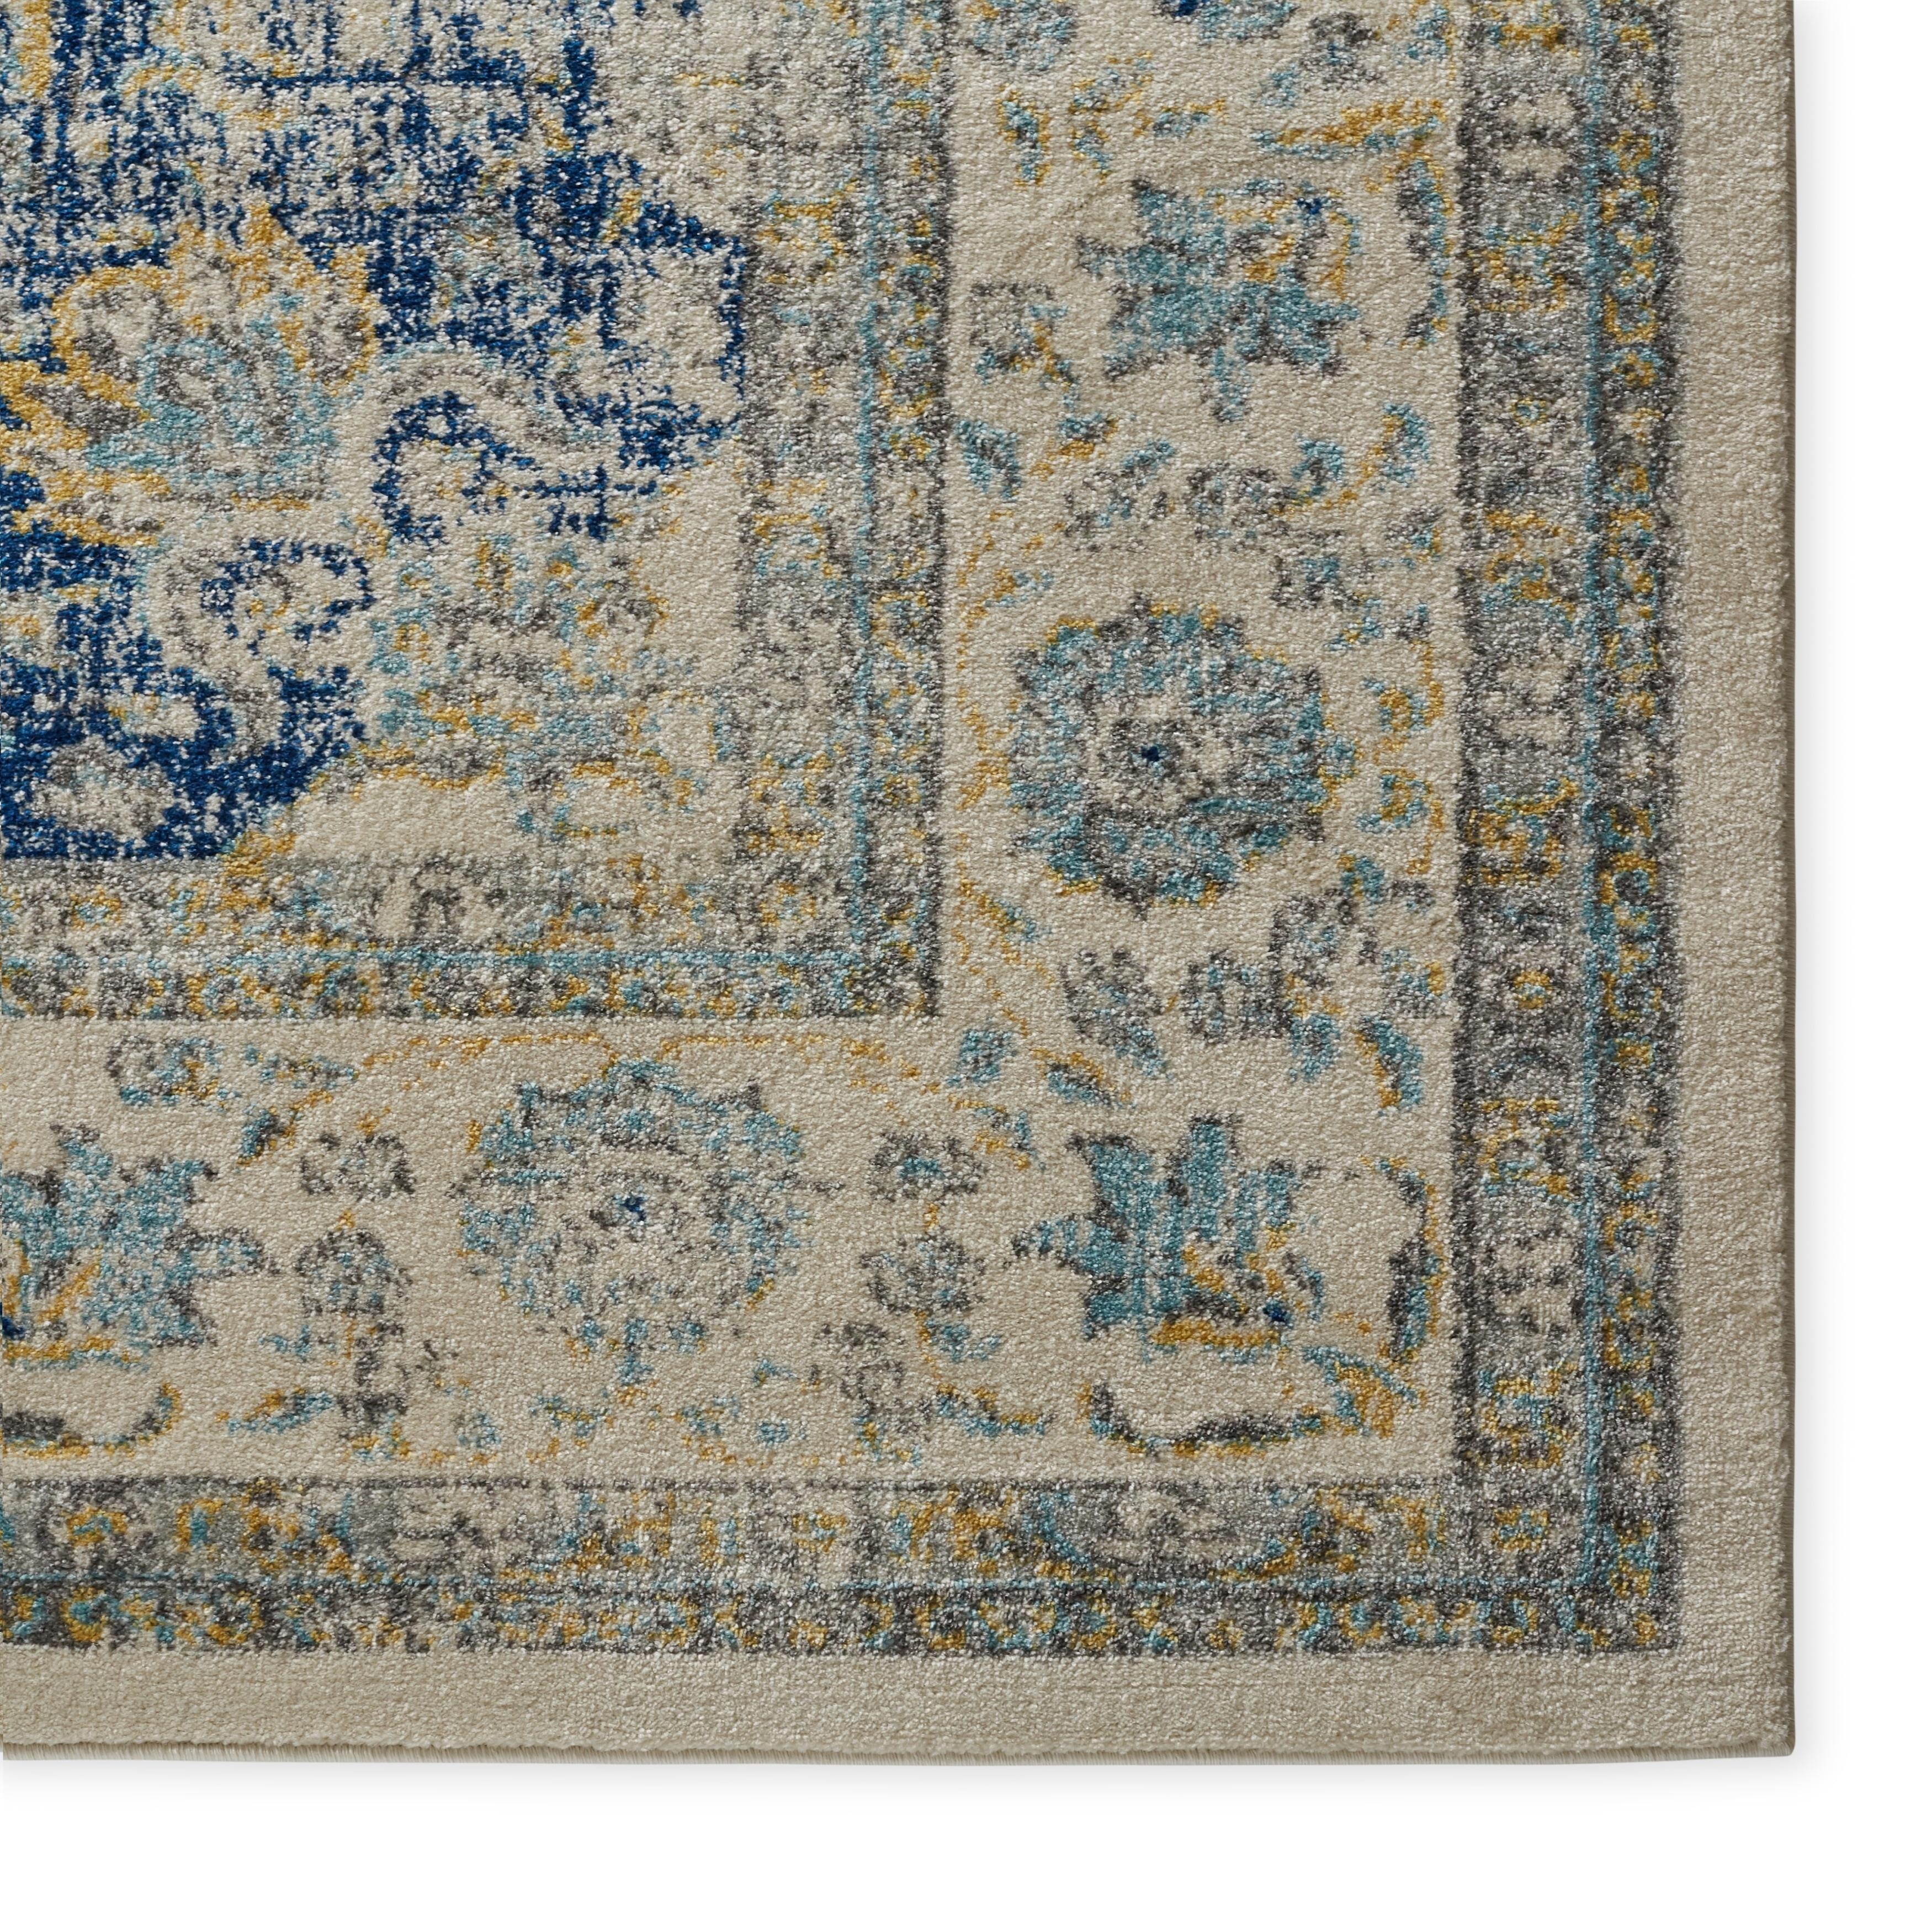 Safavieh Evoke Vintage Oriental Ivory Blue Distressed Rug 8 x